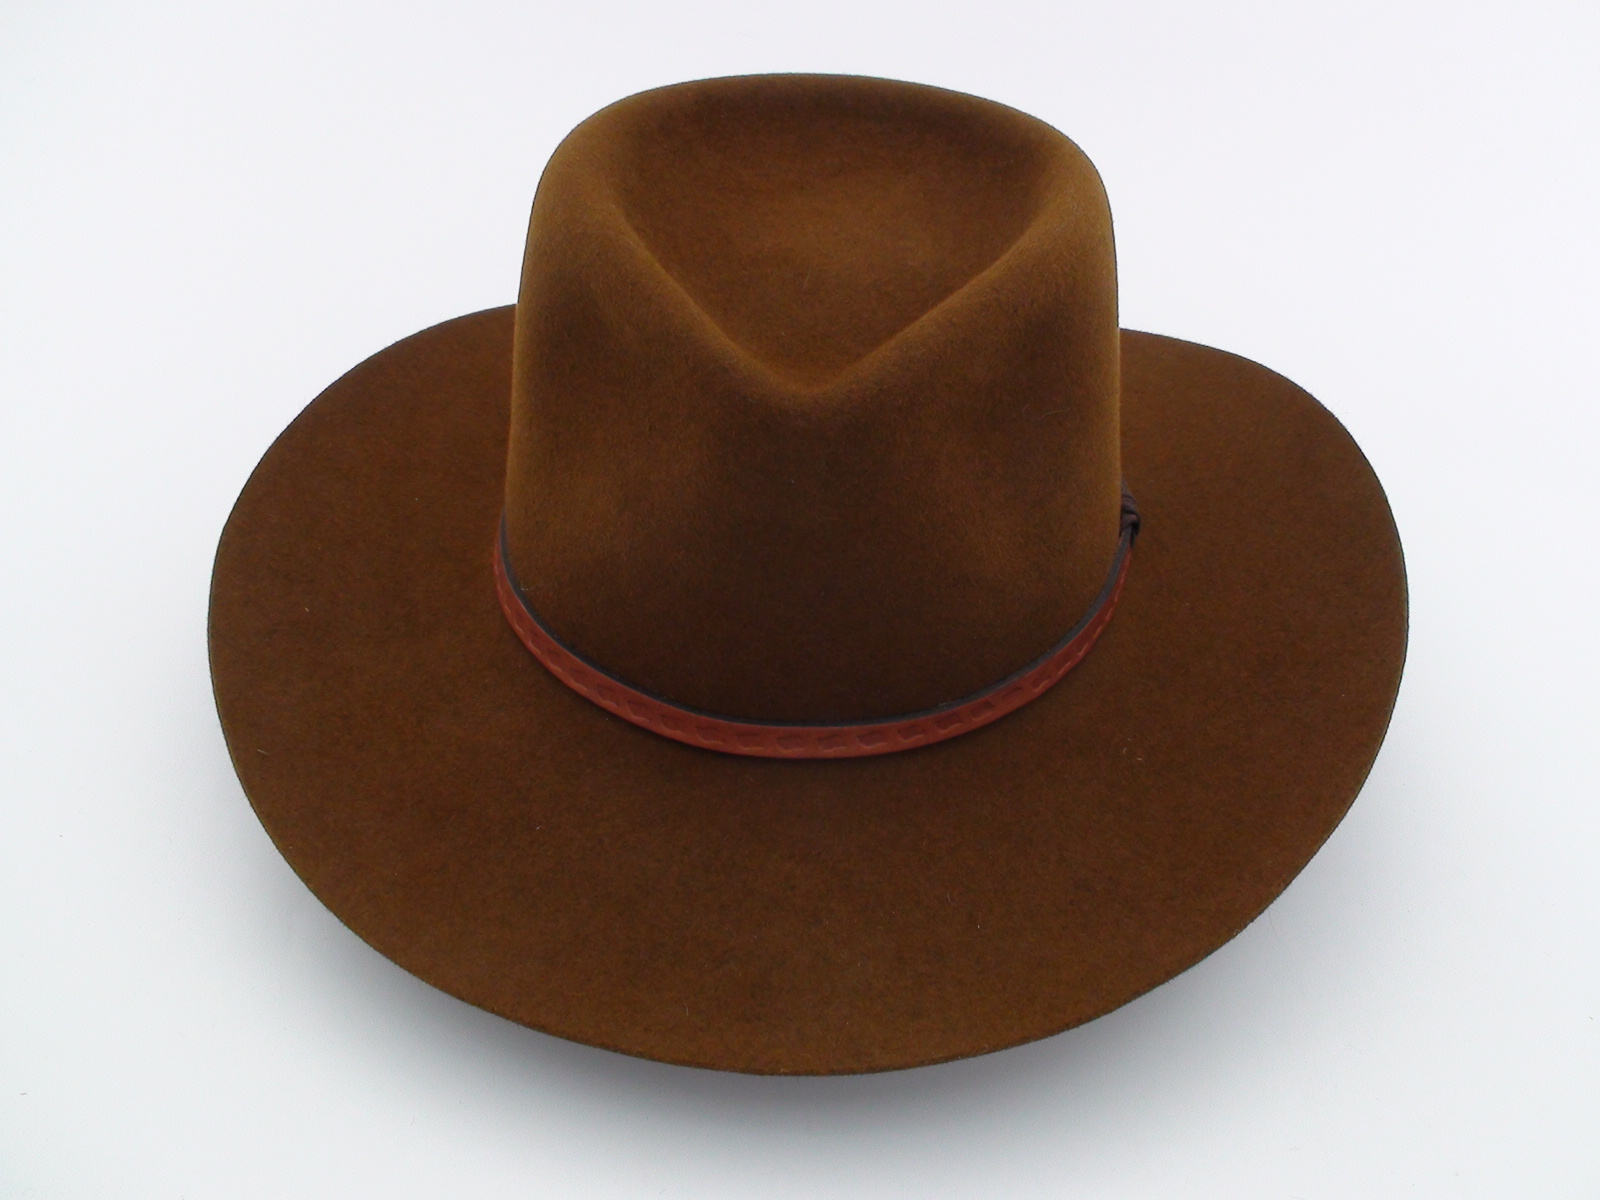 Smithbilt Hats Brown Fur Felt Western Cowboy Hat - Bernard Hats 776f9f6c50f